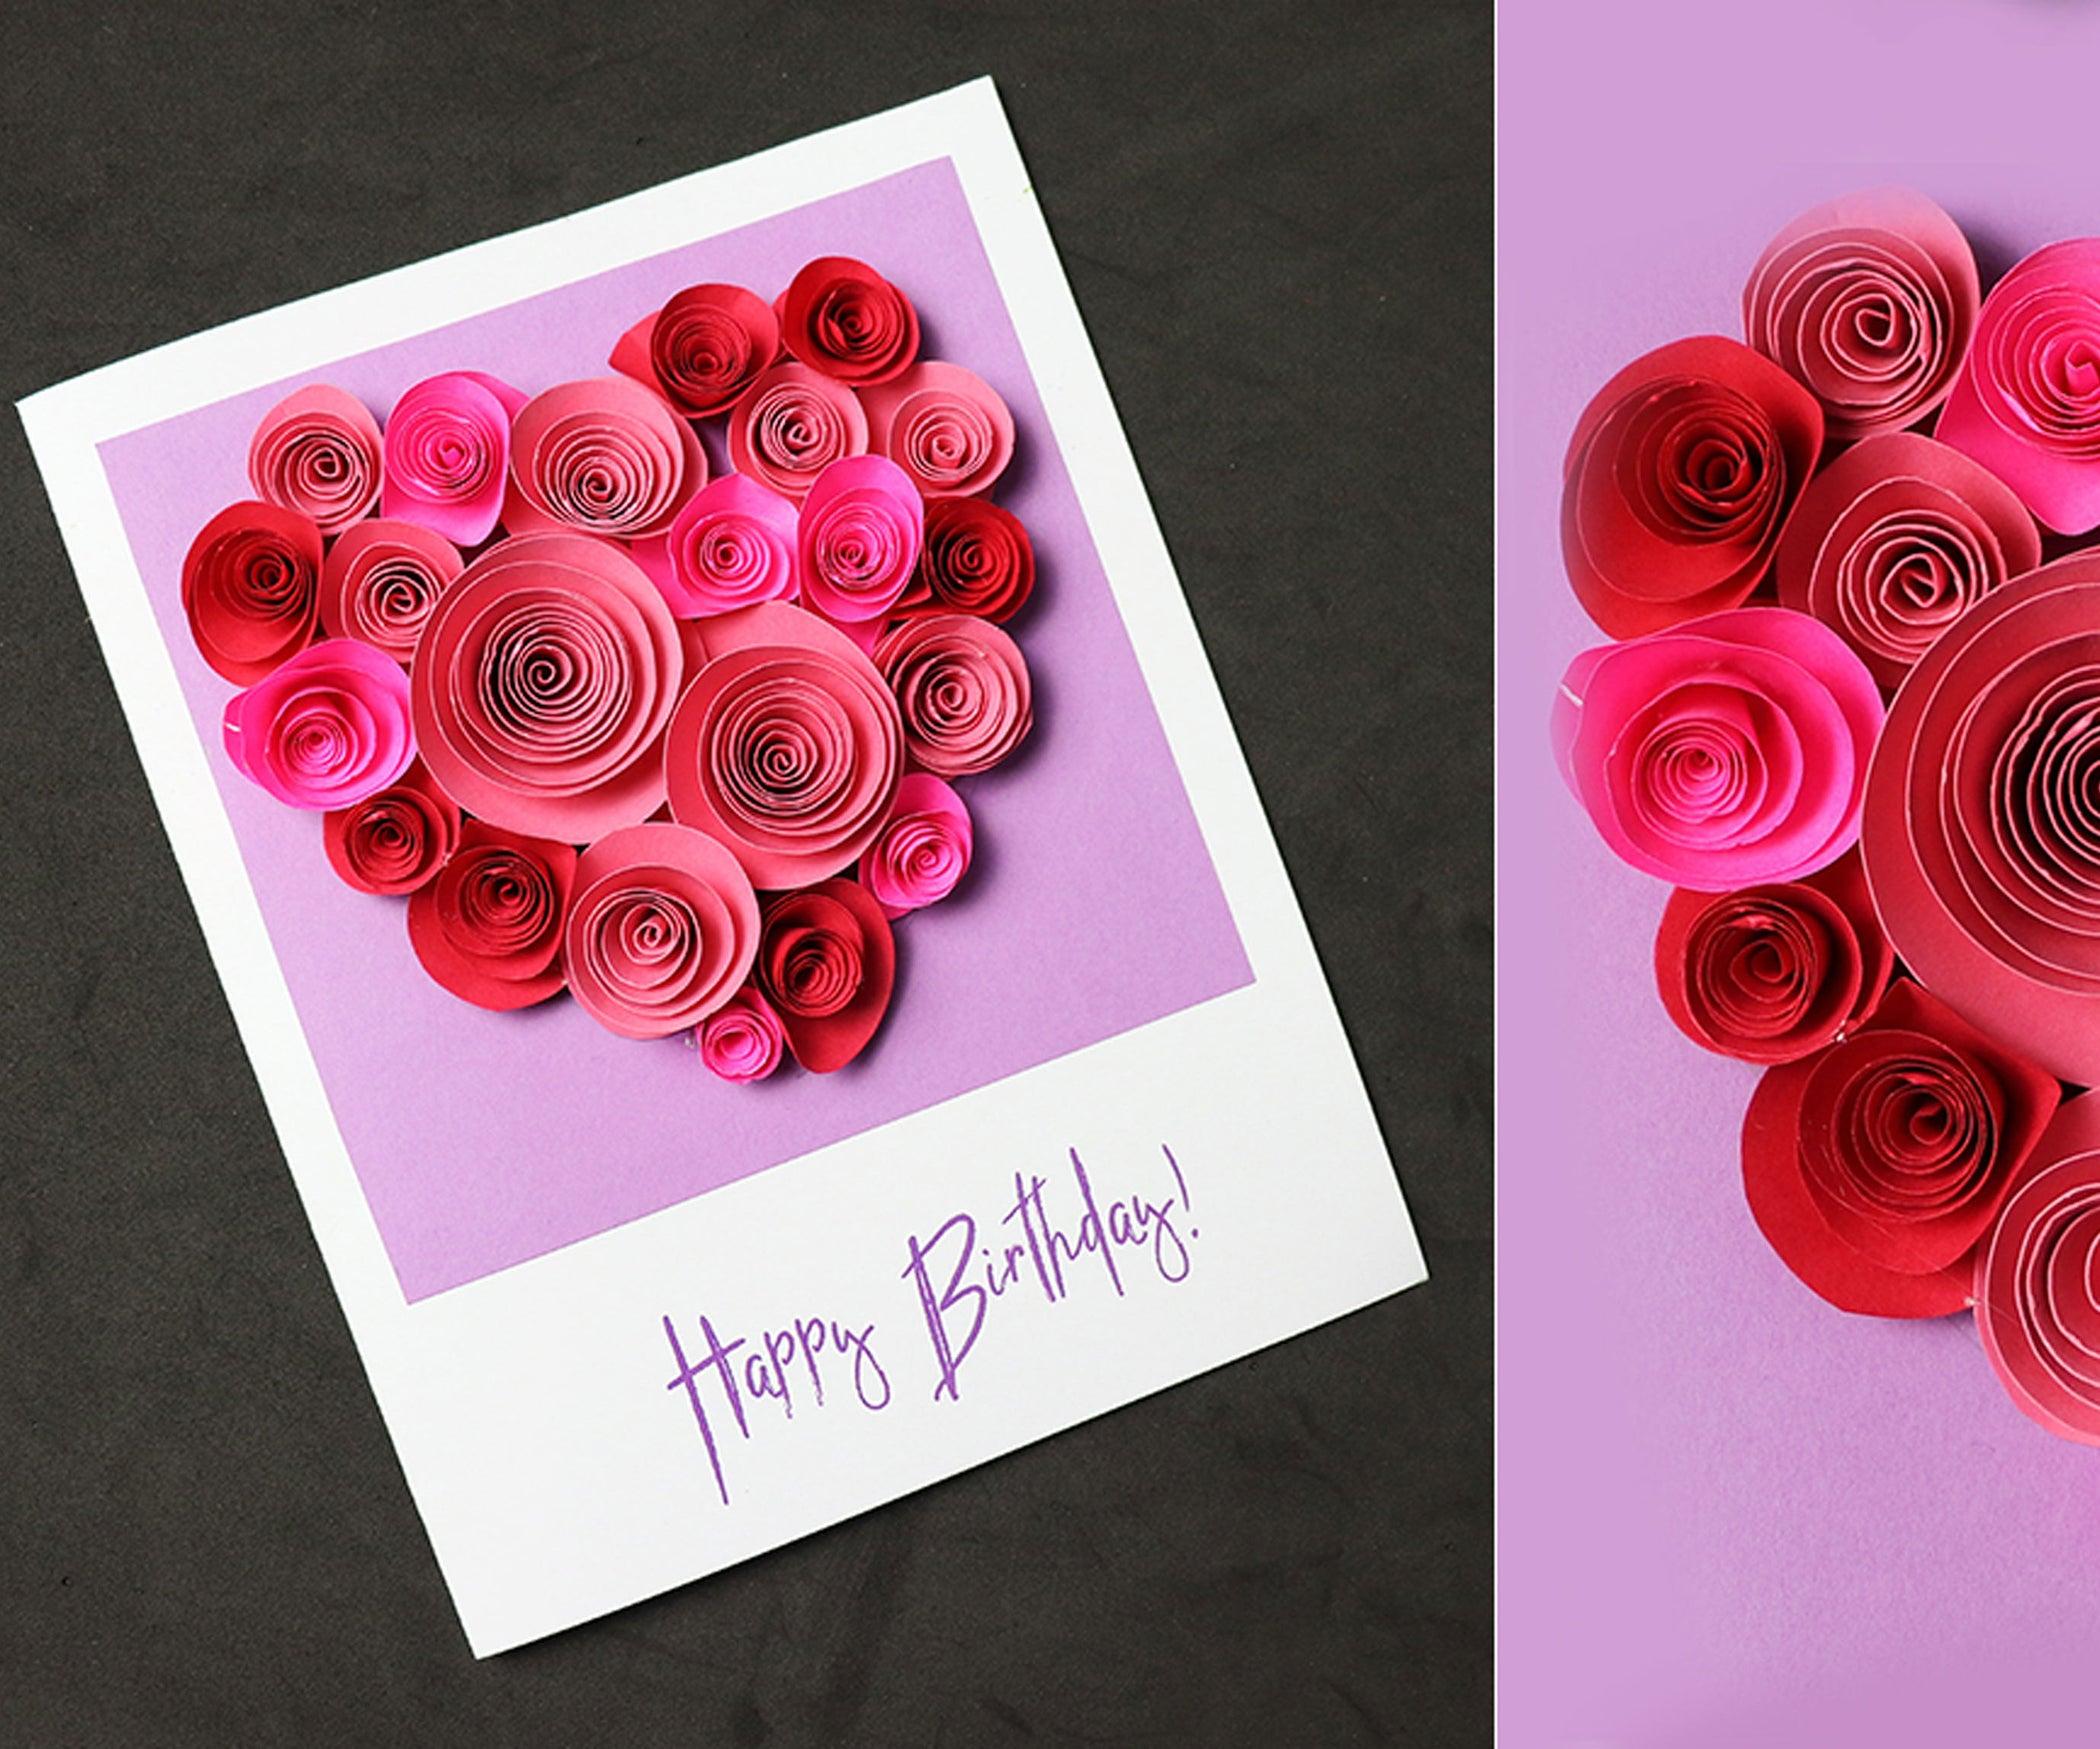 beautiful birthday greeting card idea  pop up rose heart